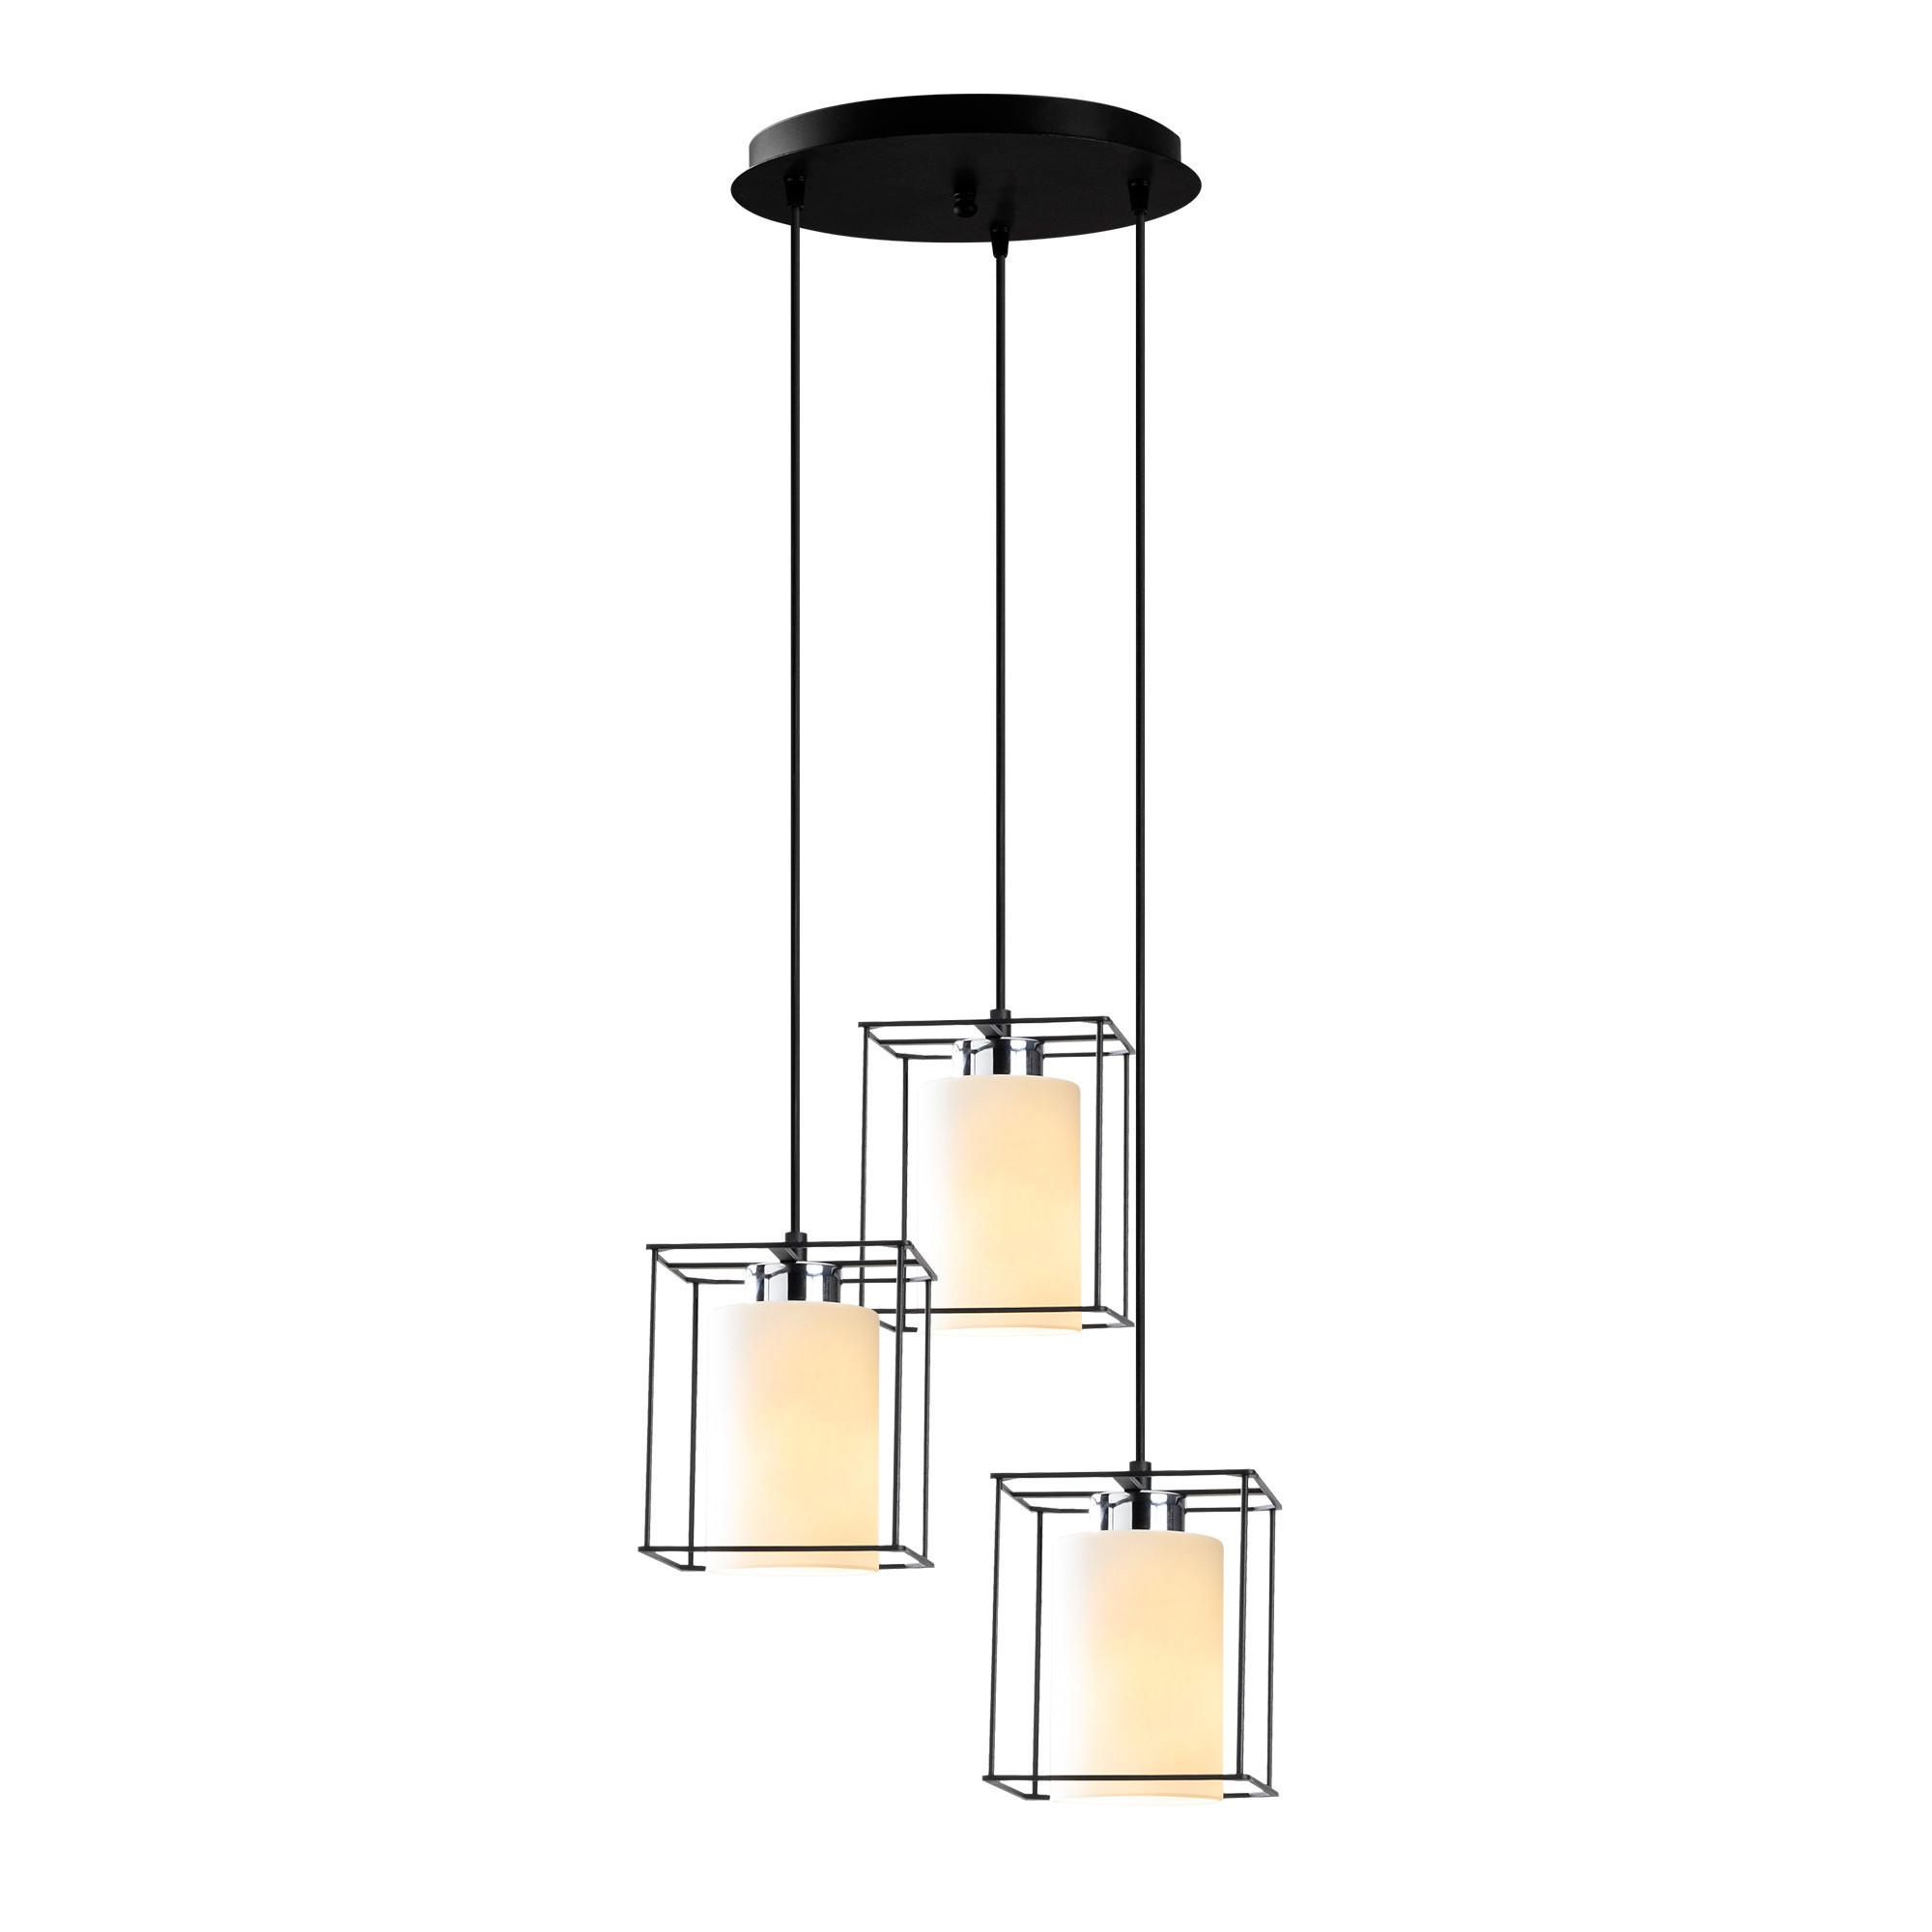 Pendant Lamp Swank 702-S2 | Black